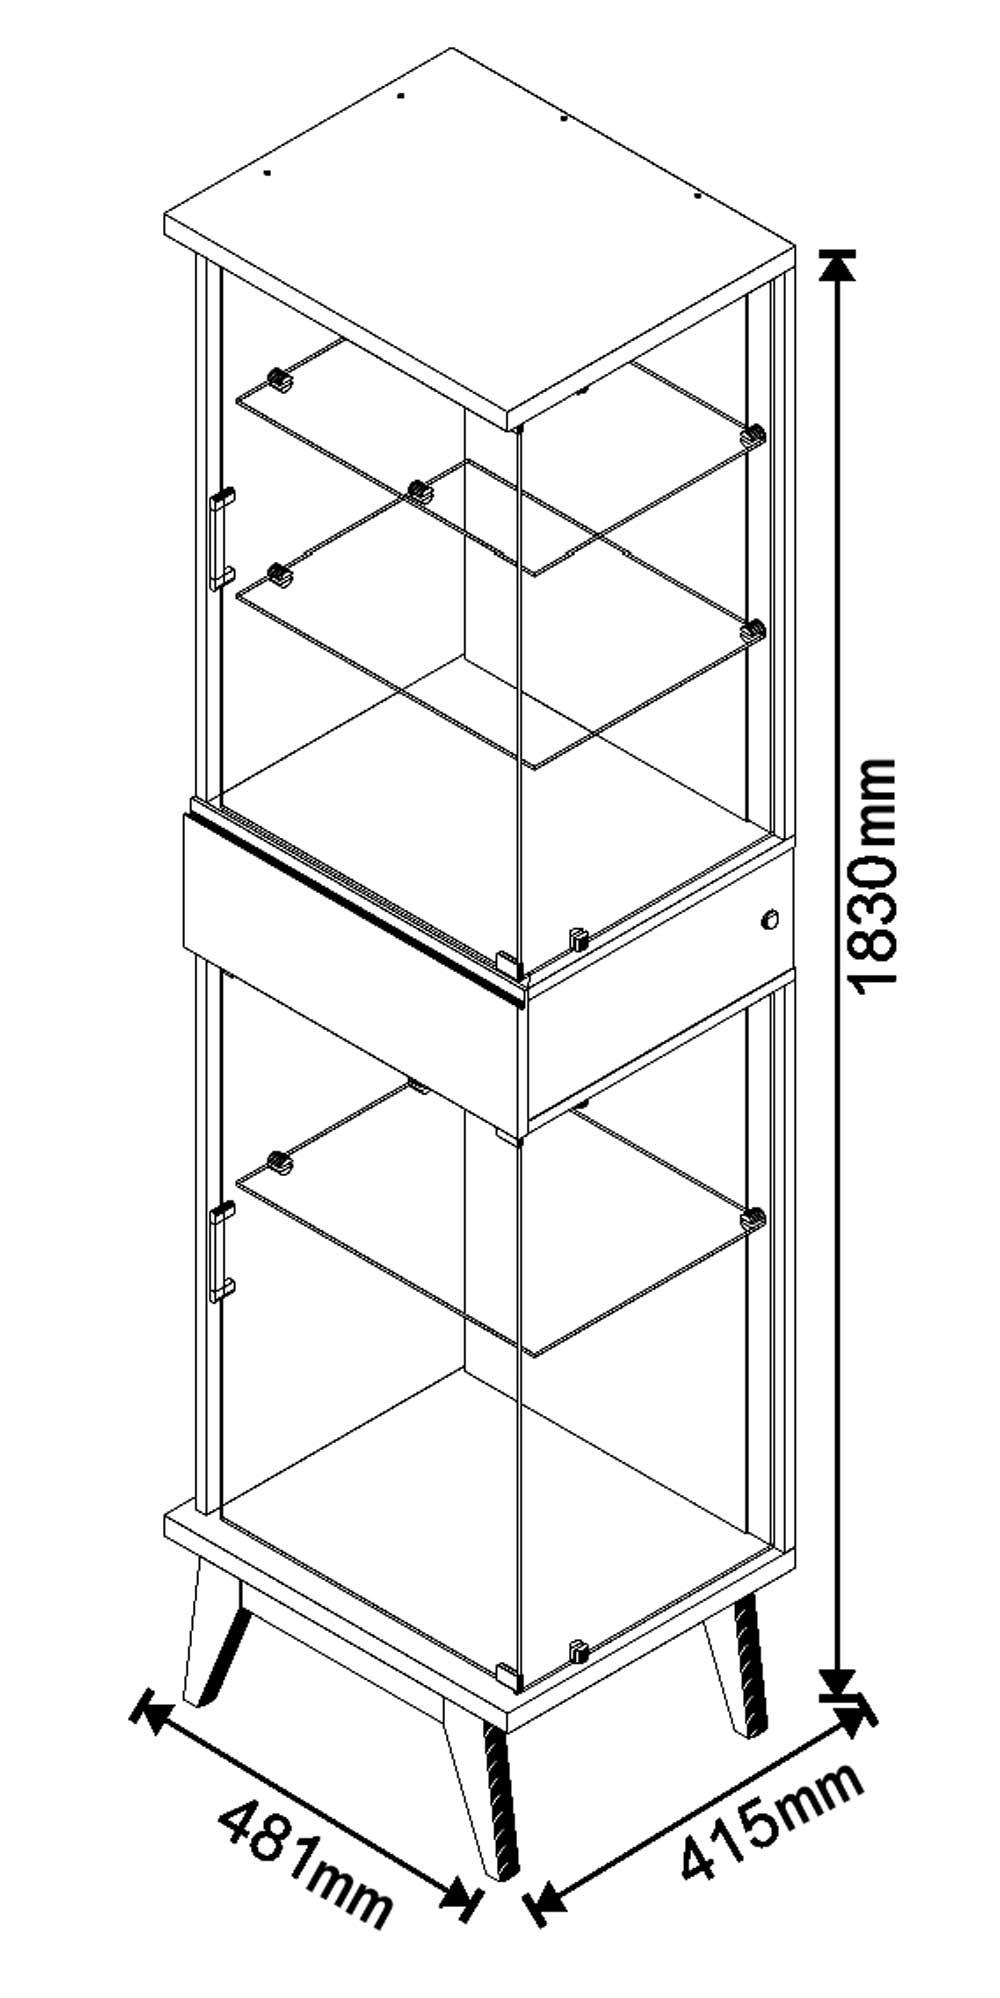 Conjunto Sala de Estar Buffet + Aparador + Cristaleira Nuance - Imcal Móveis